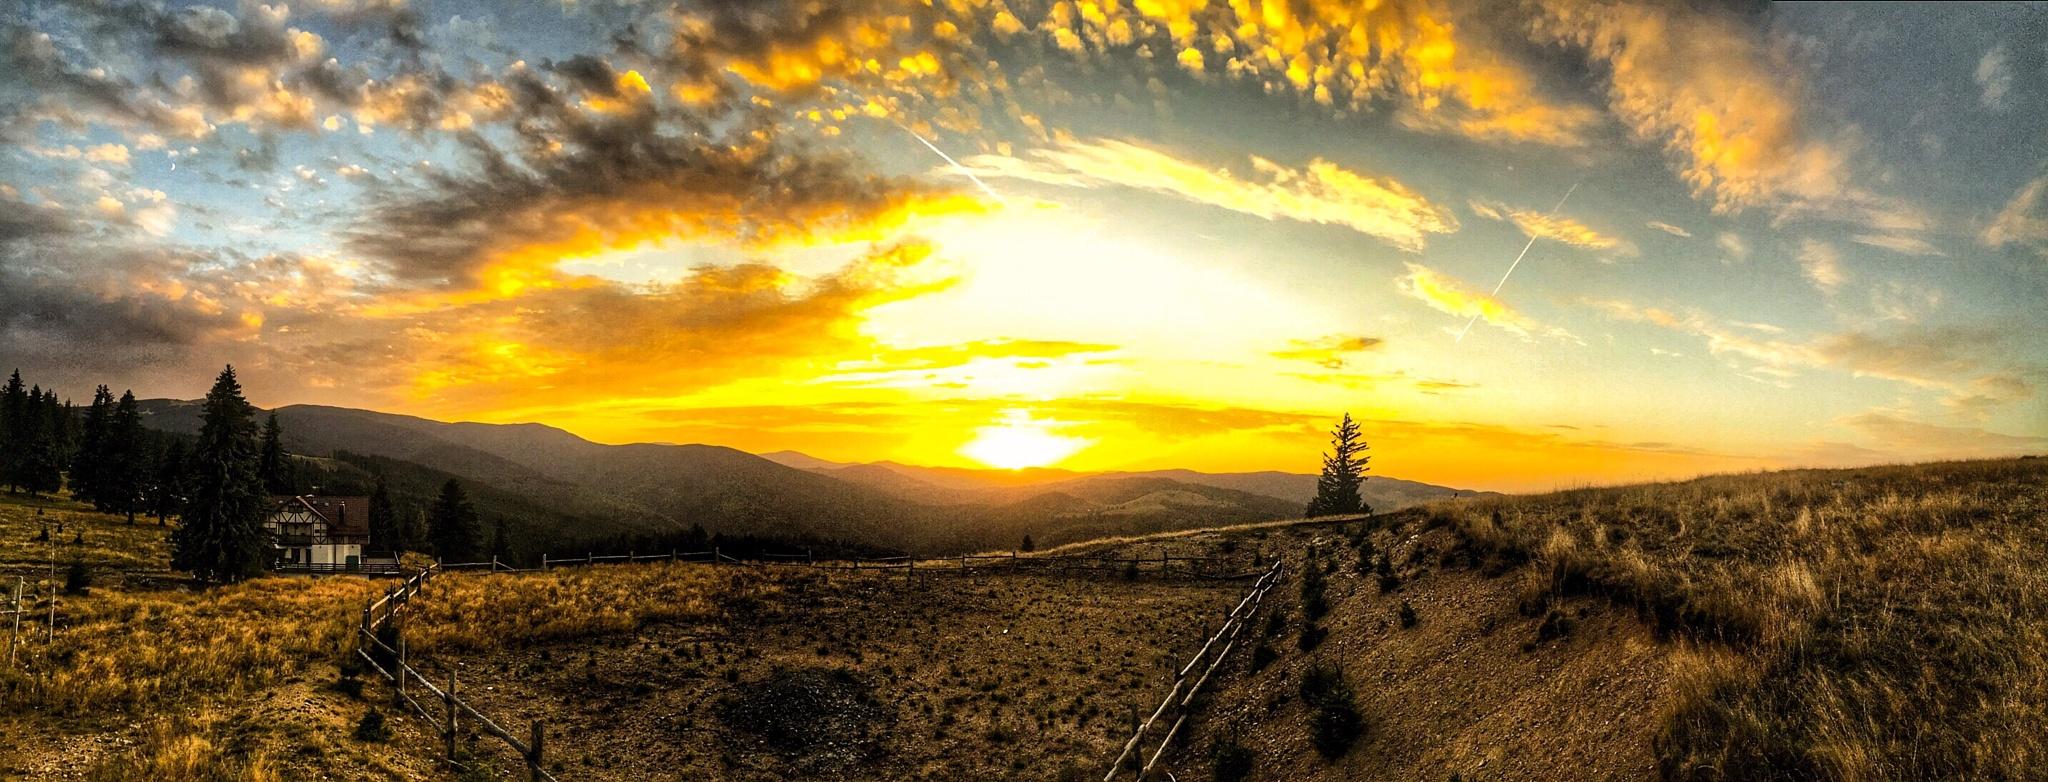 Plano-the sunset  by Adi Gli